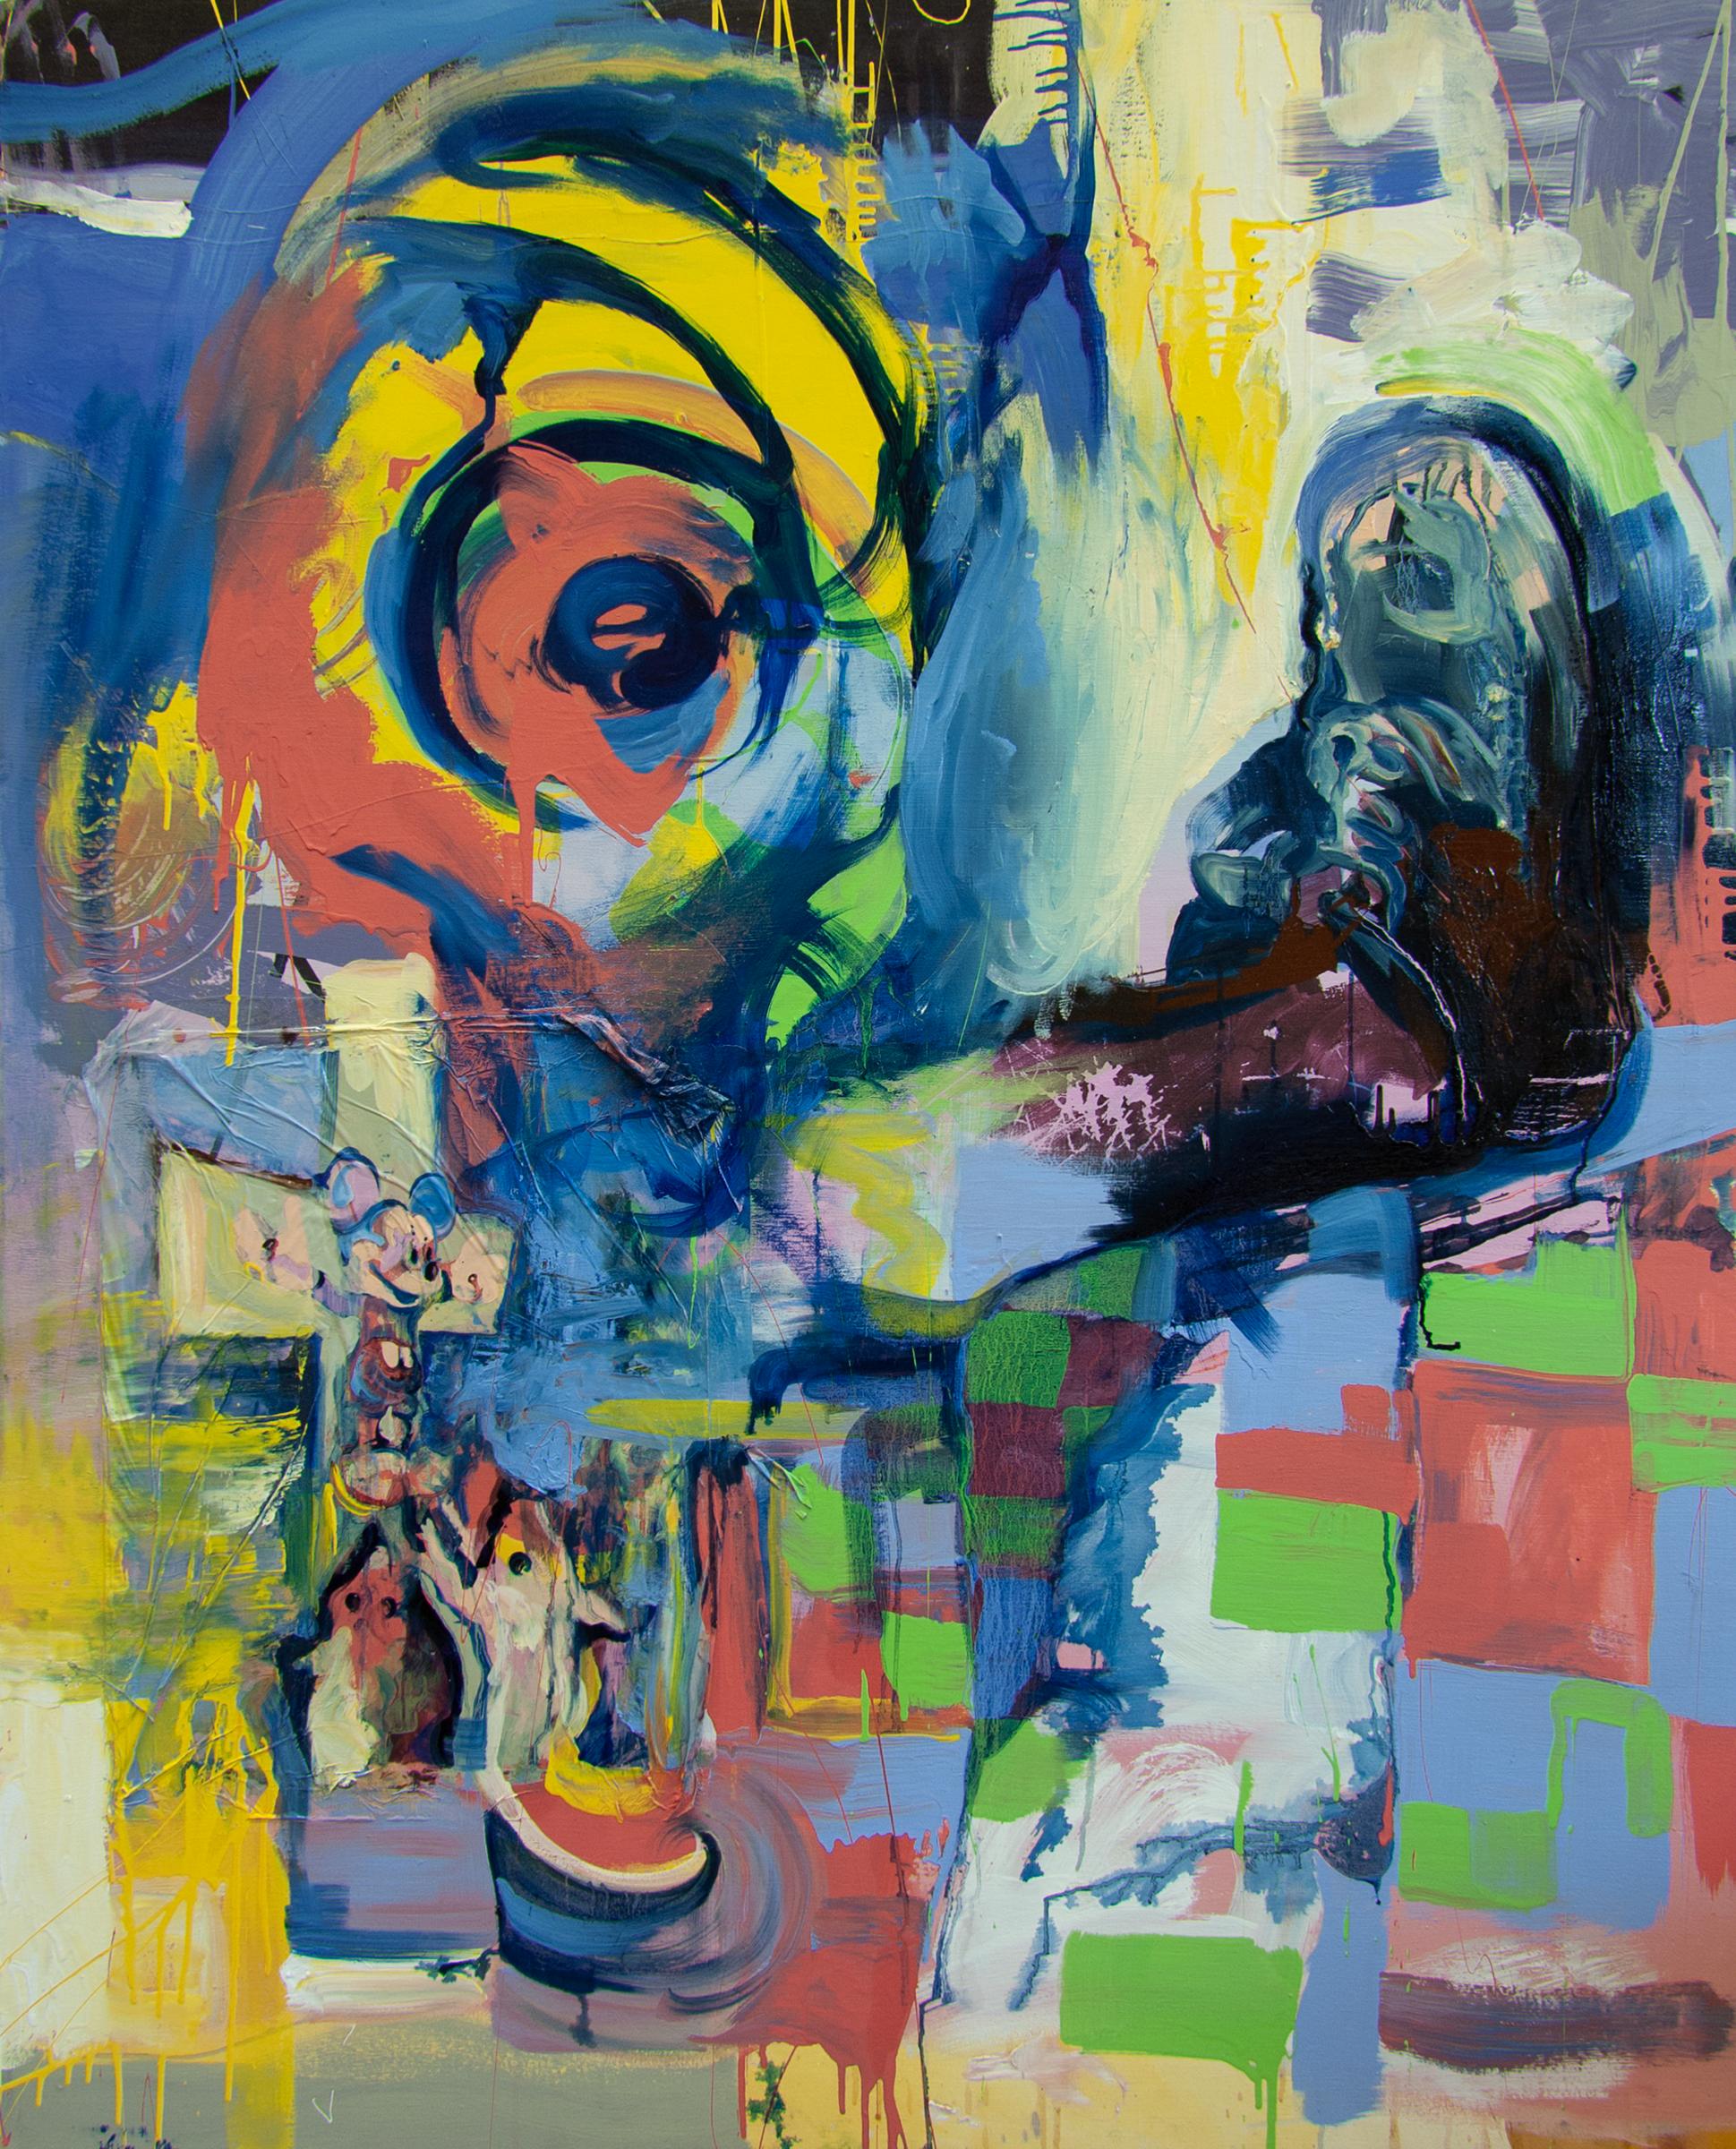 KITF_paint2018.png